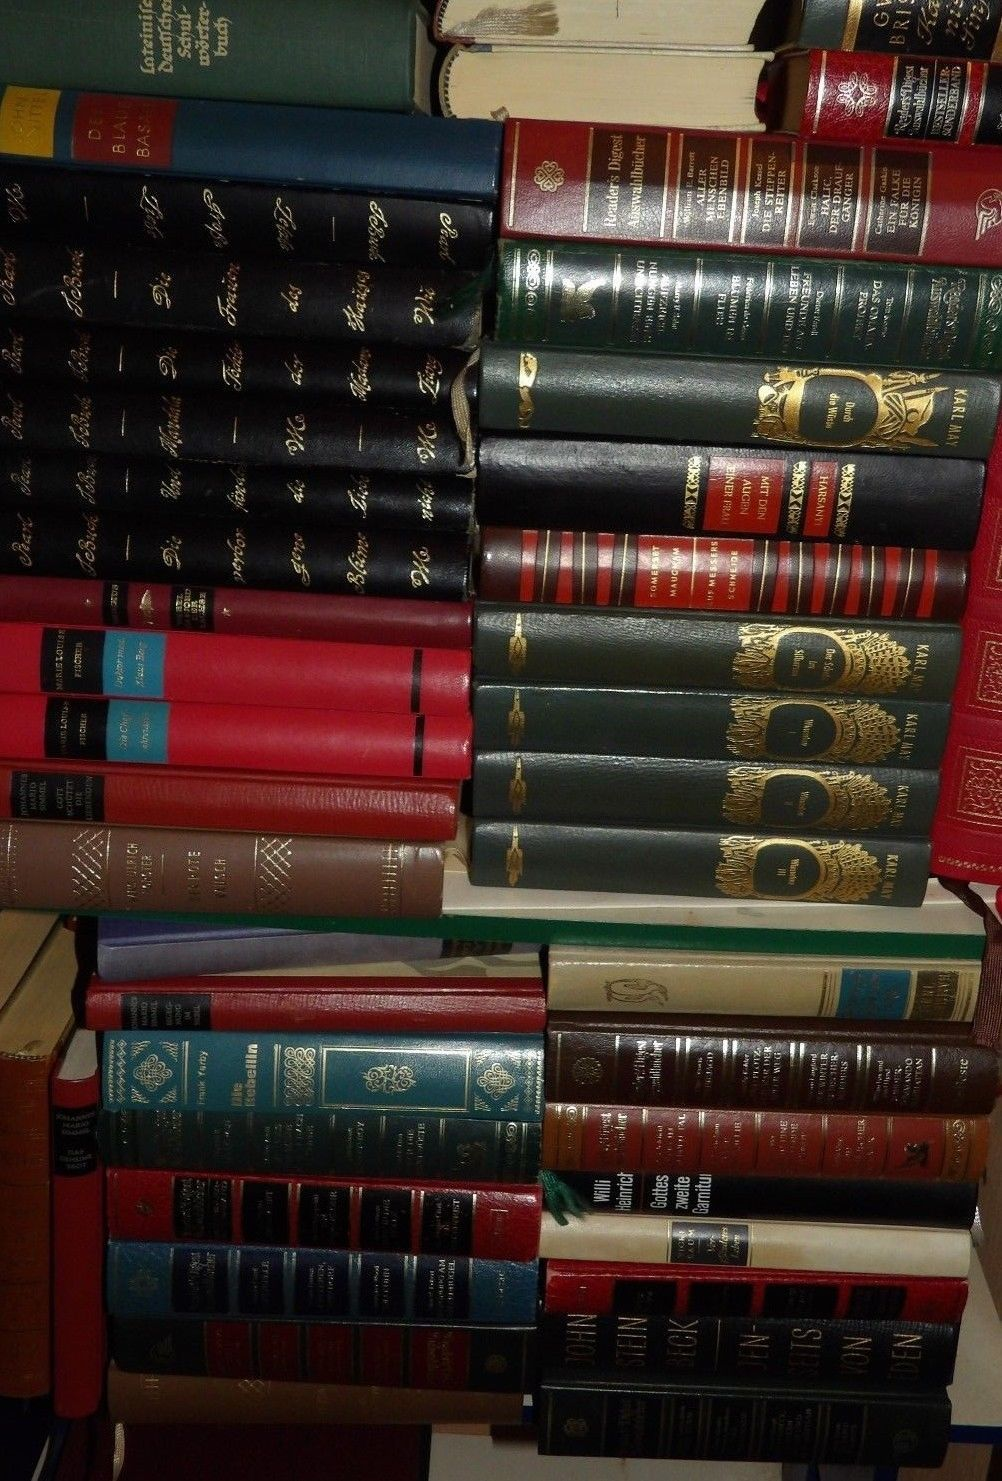 25 alte Leder Halbleder Bücher Literatur Romane Konvolut Dekoration Paket